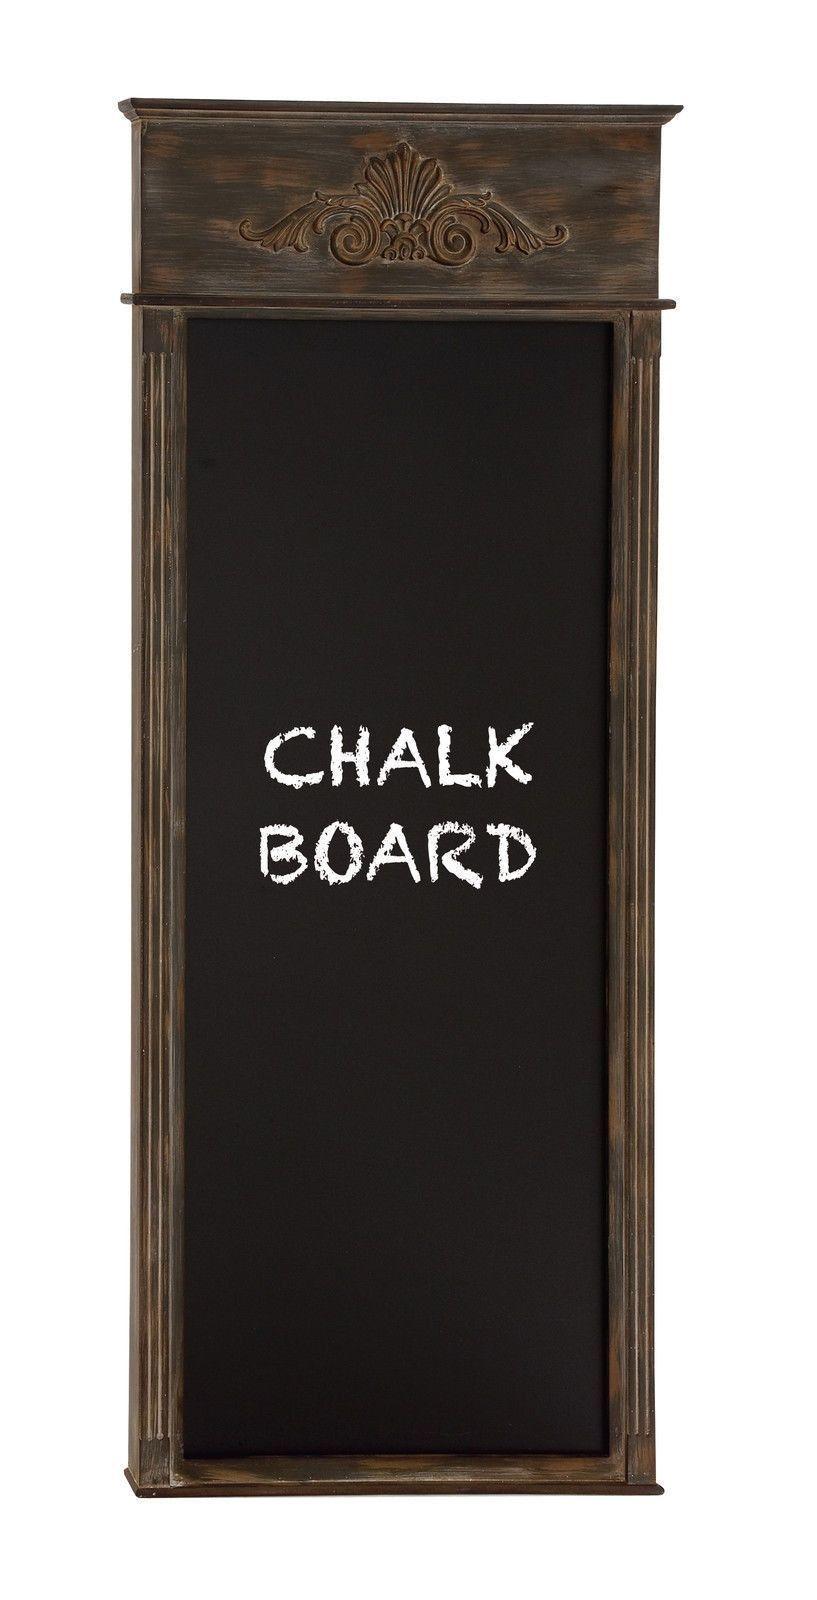 72 tall dark wood fleur de lis chalk blackboard french country restaurant decor